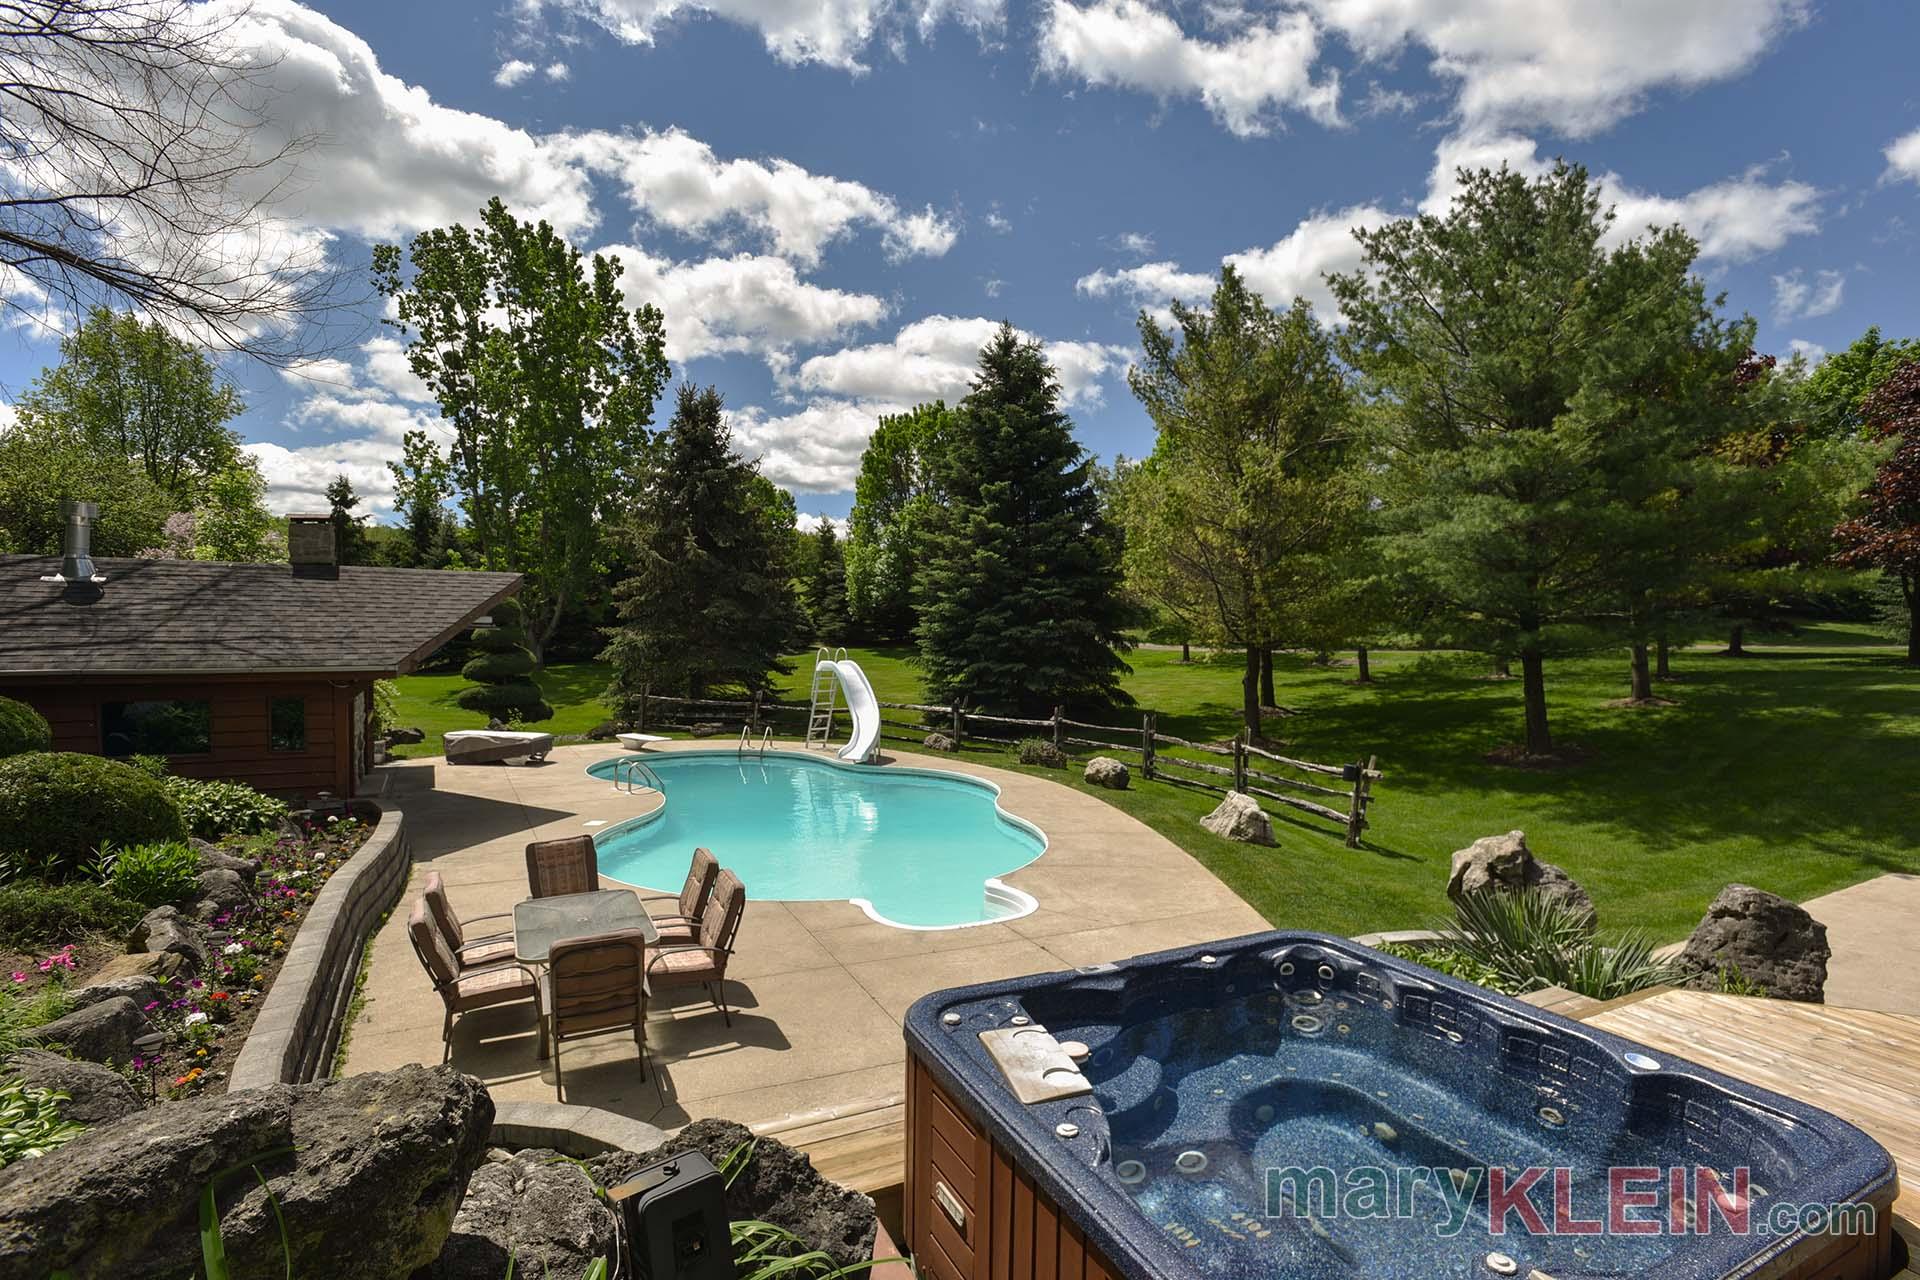 Backyard, 10 Acres, For Sale, Caledon